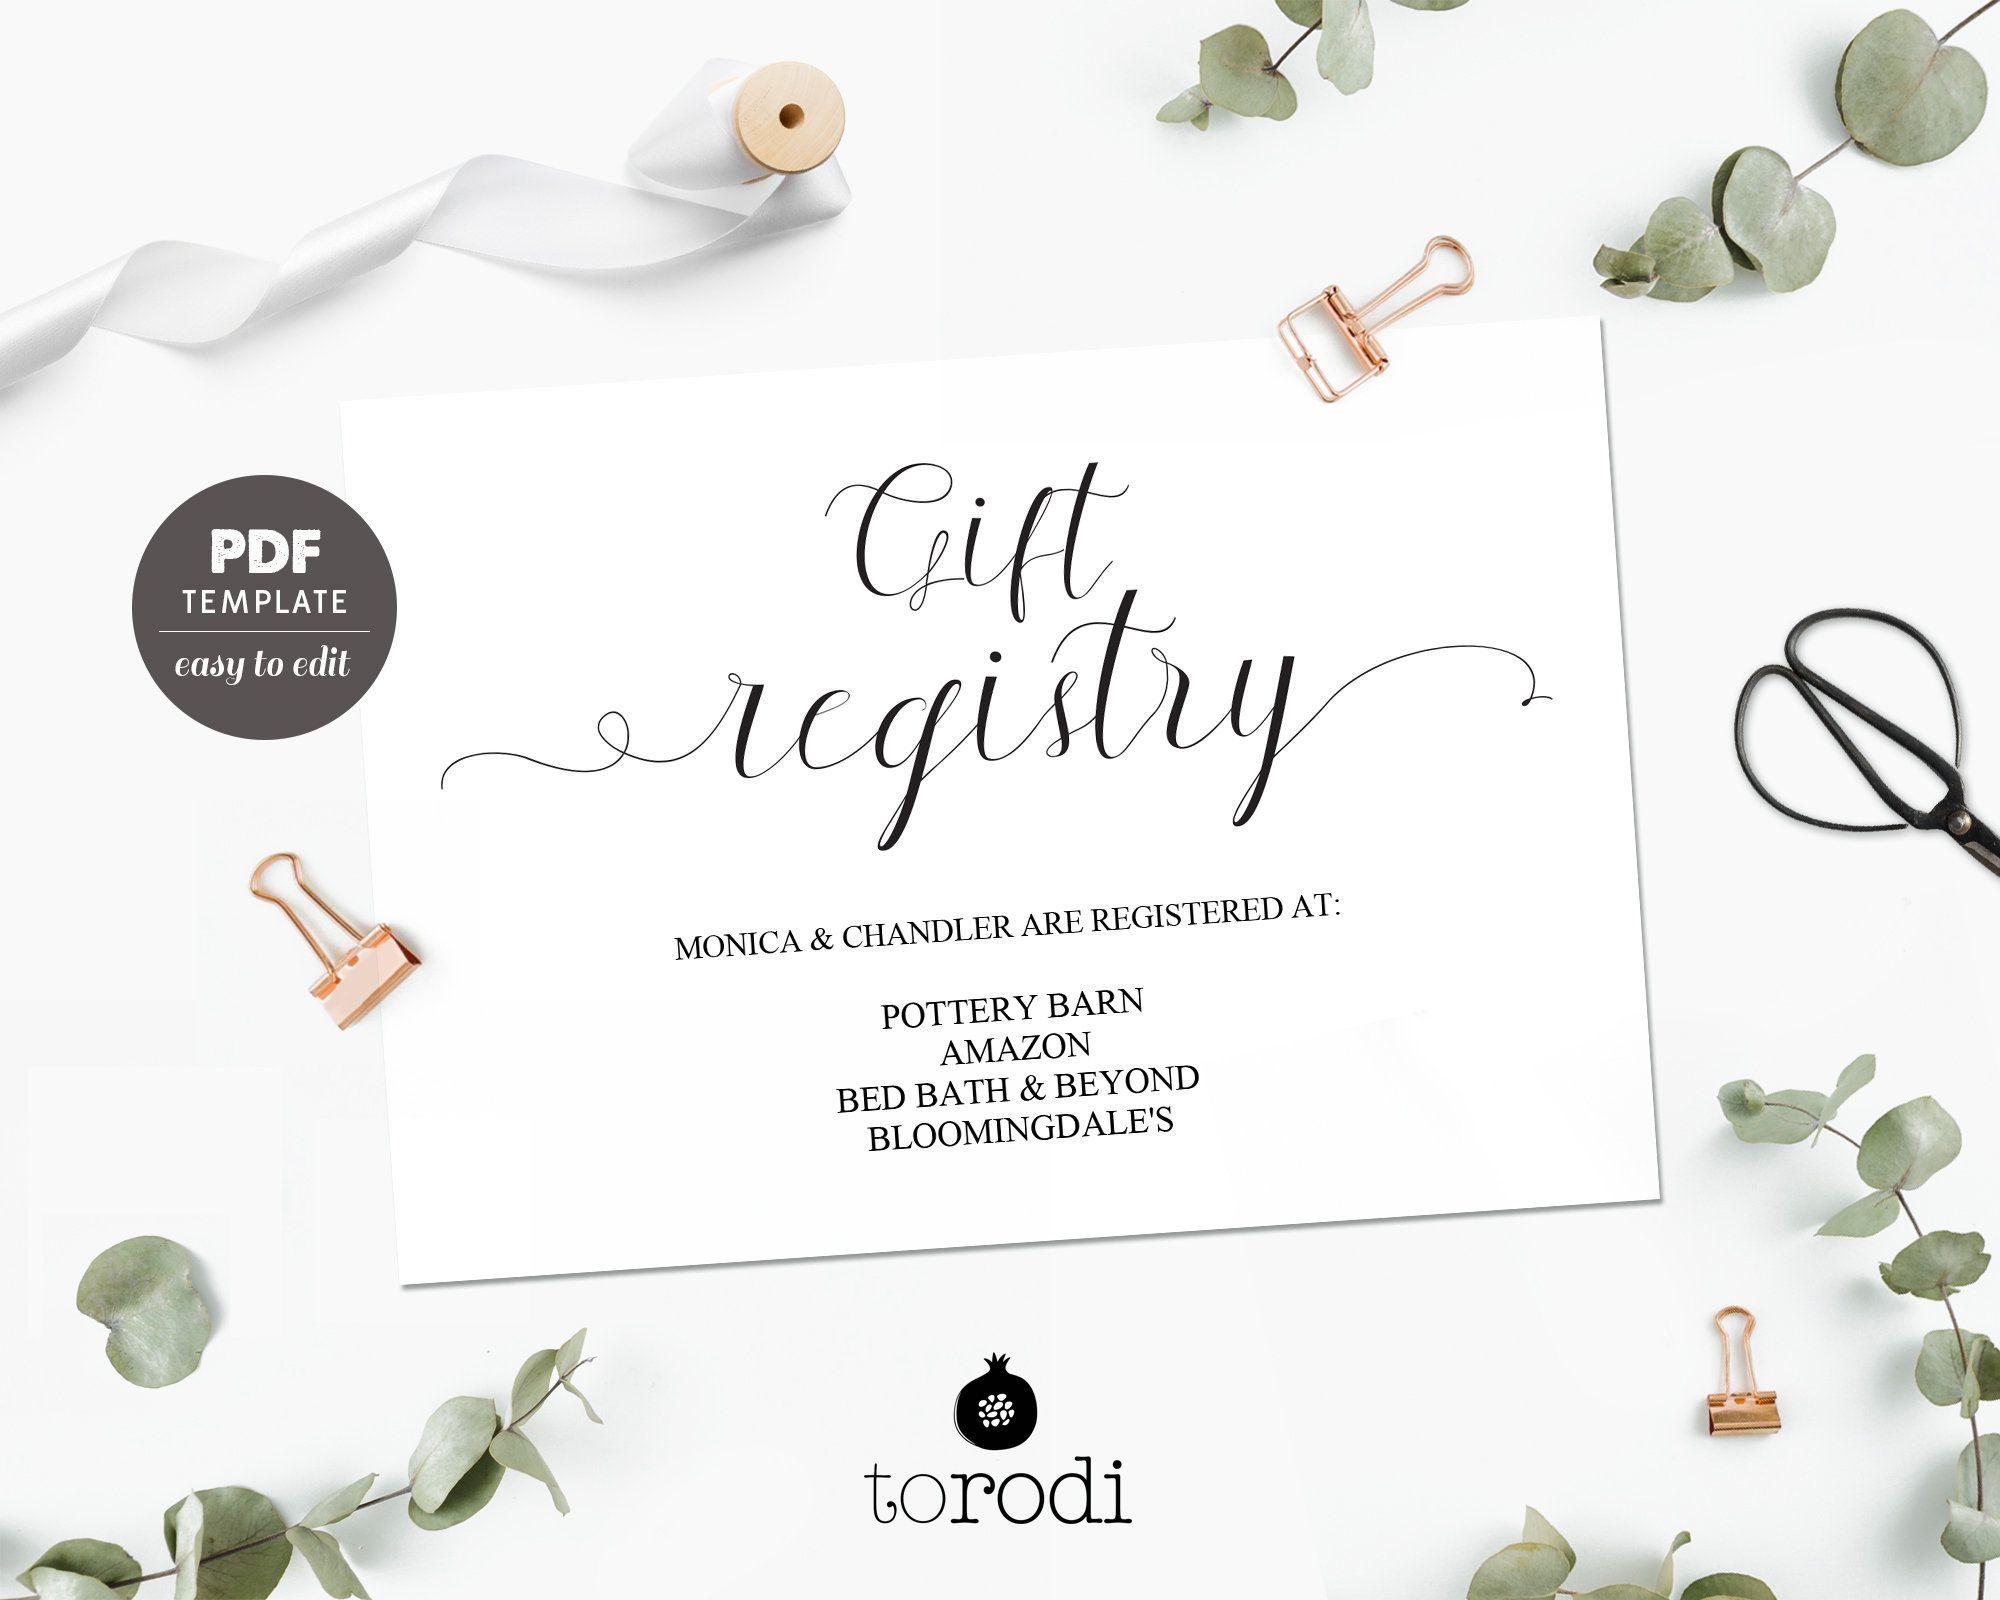 Gift Registry Card Template Wedding Registry Card Registry Insert Template Wedding Printable Wedding Template Editable Pdf Card Wtc03 Wedding Registry Cards Gift Registry Cards Registry Cards